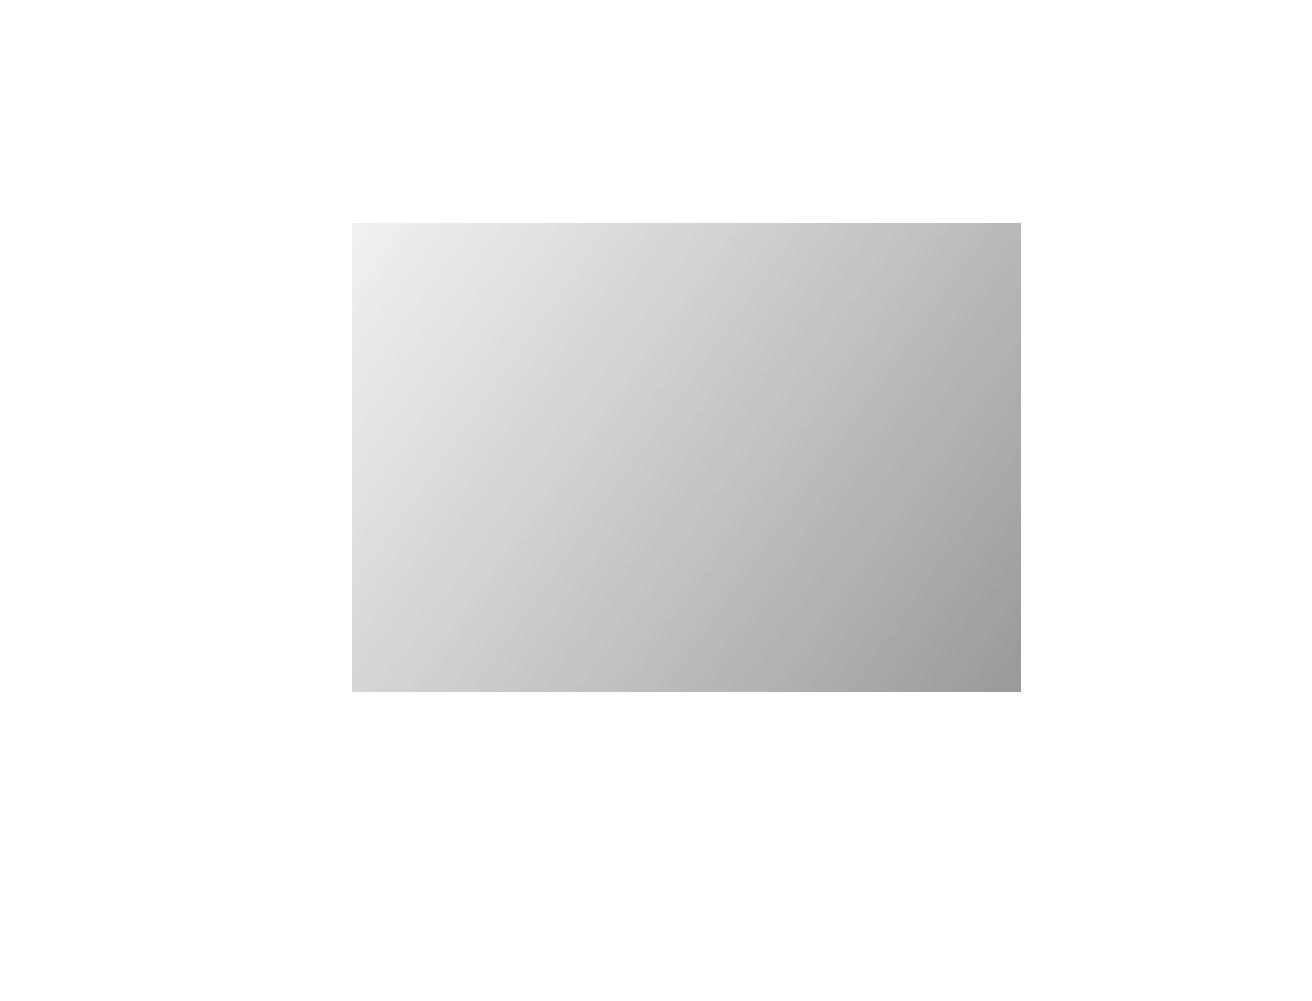 Proline Basic spiegel rechthoek op alu frame 120cm - xmm (bxd)